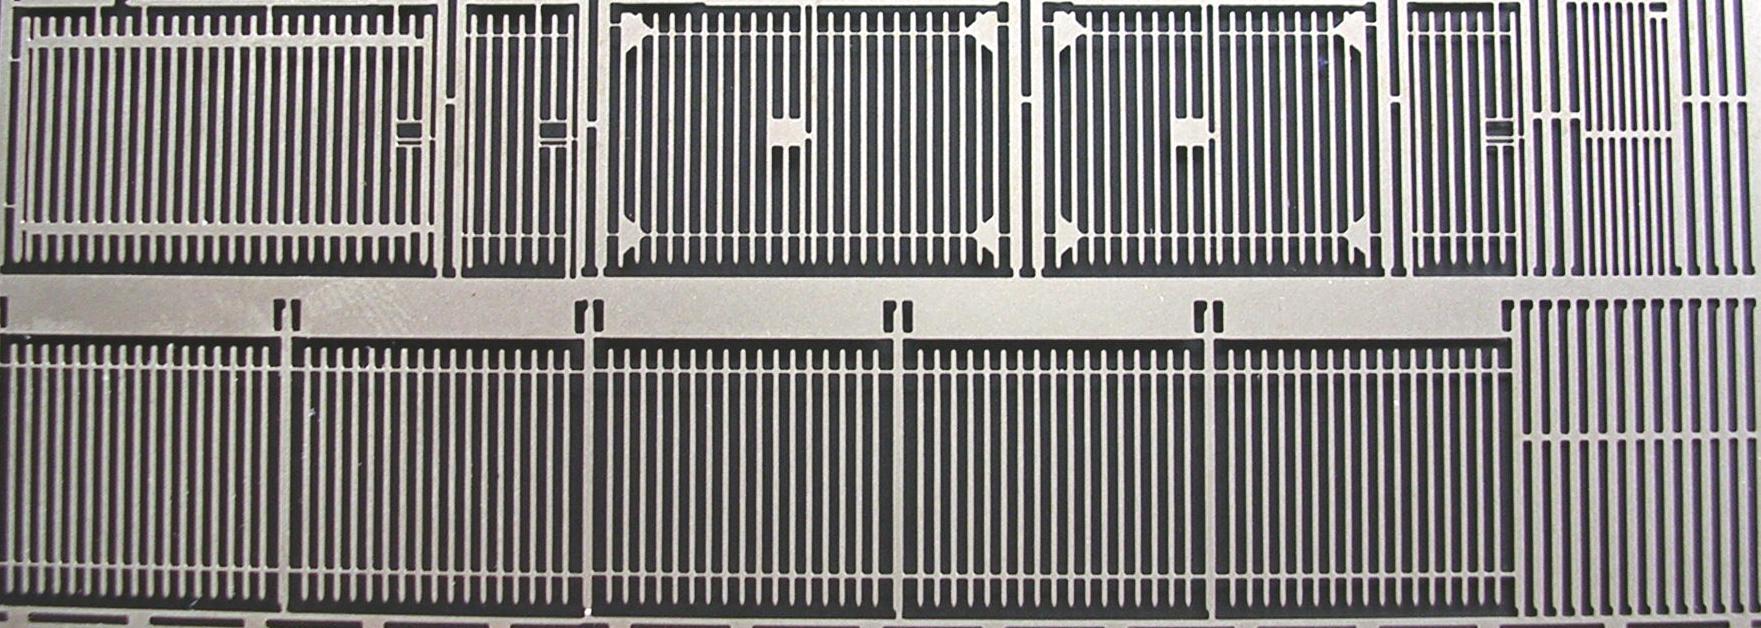 N705 Modern 8ft Paling Security Fencing & Gates